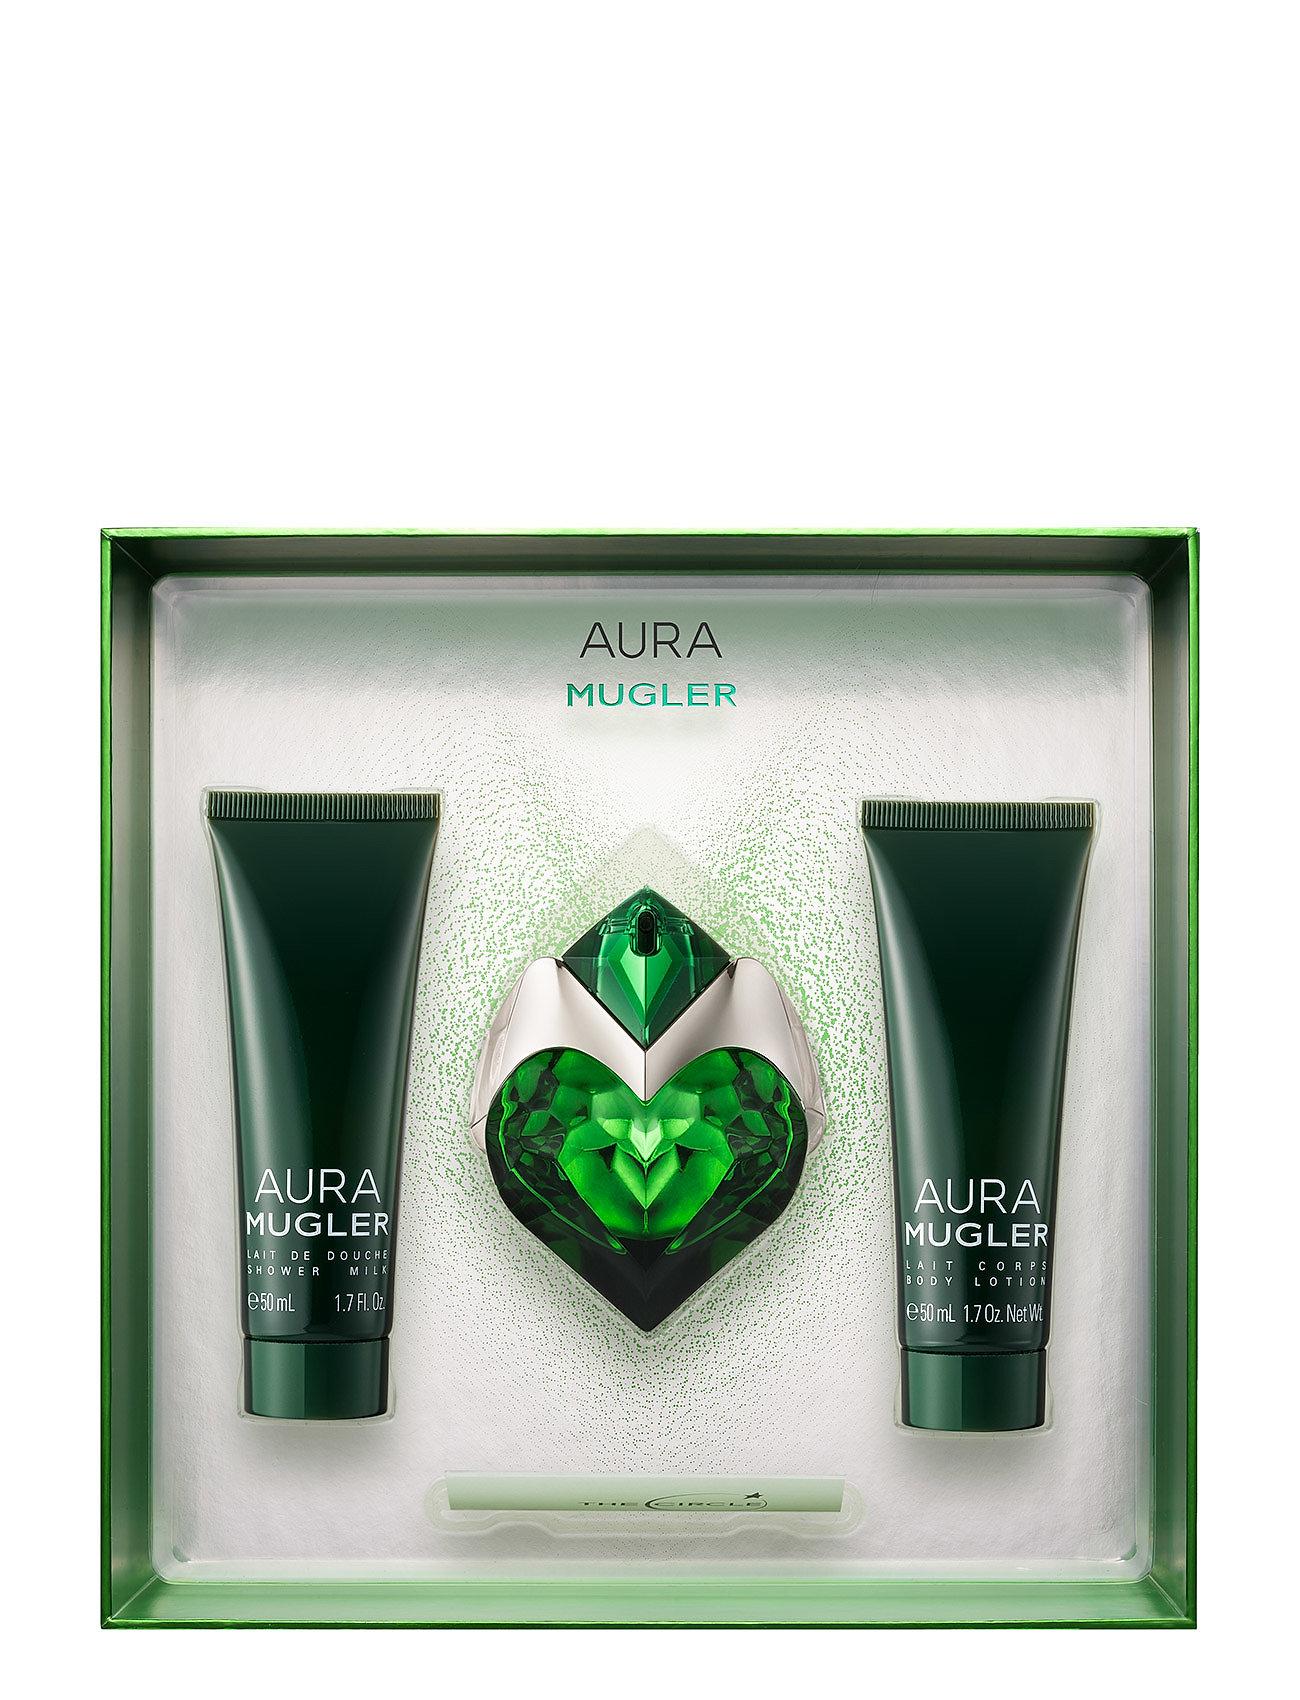 Image of Aura Edp 30ml, Bl 50ml, Perfuming Pen Beauty WOMEN Skin Care Perfume Sets Body Care Creams & Lotions & Bodybutter Mugler (3080010729)